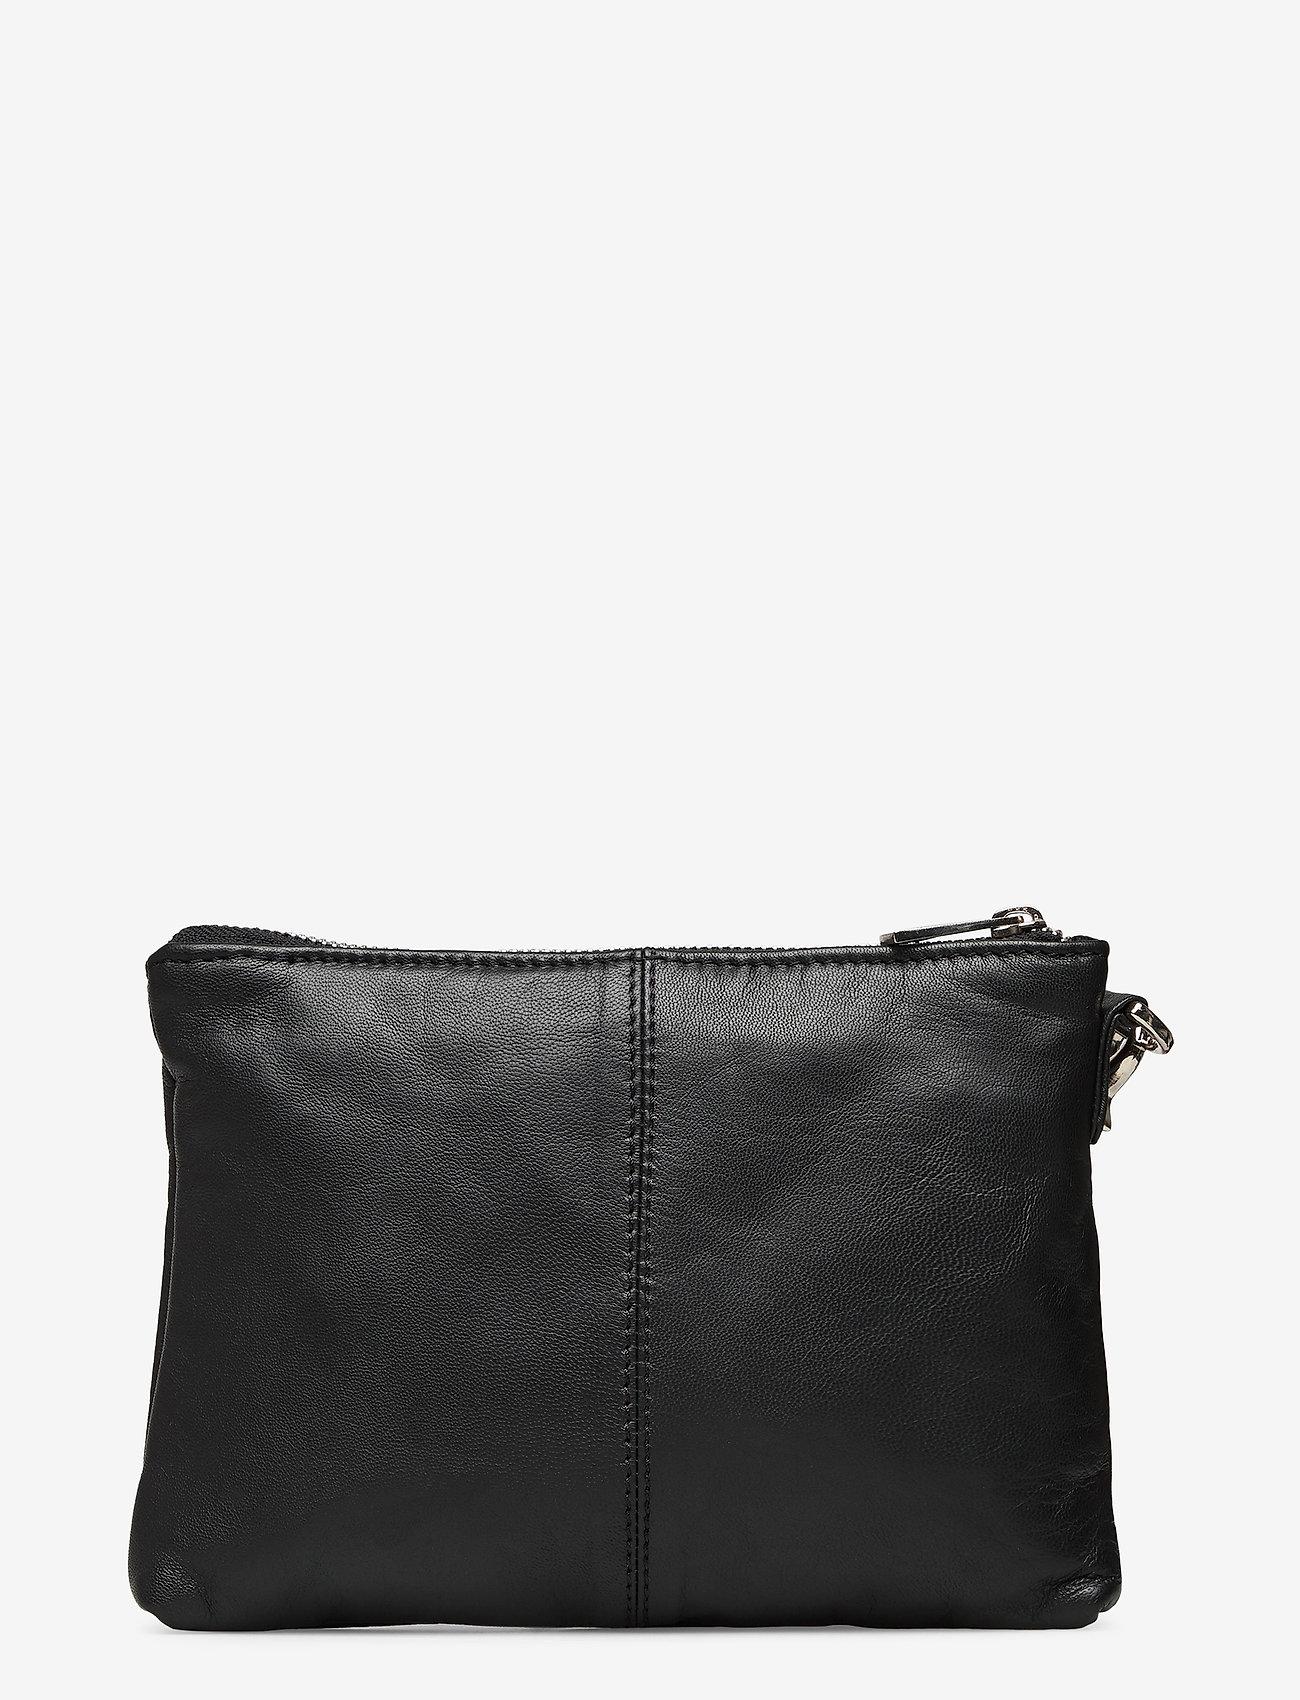 DEPECHE - Cosmetic bag - clutches - 099 black (nero) - 1